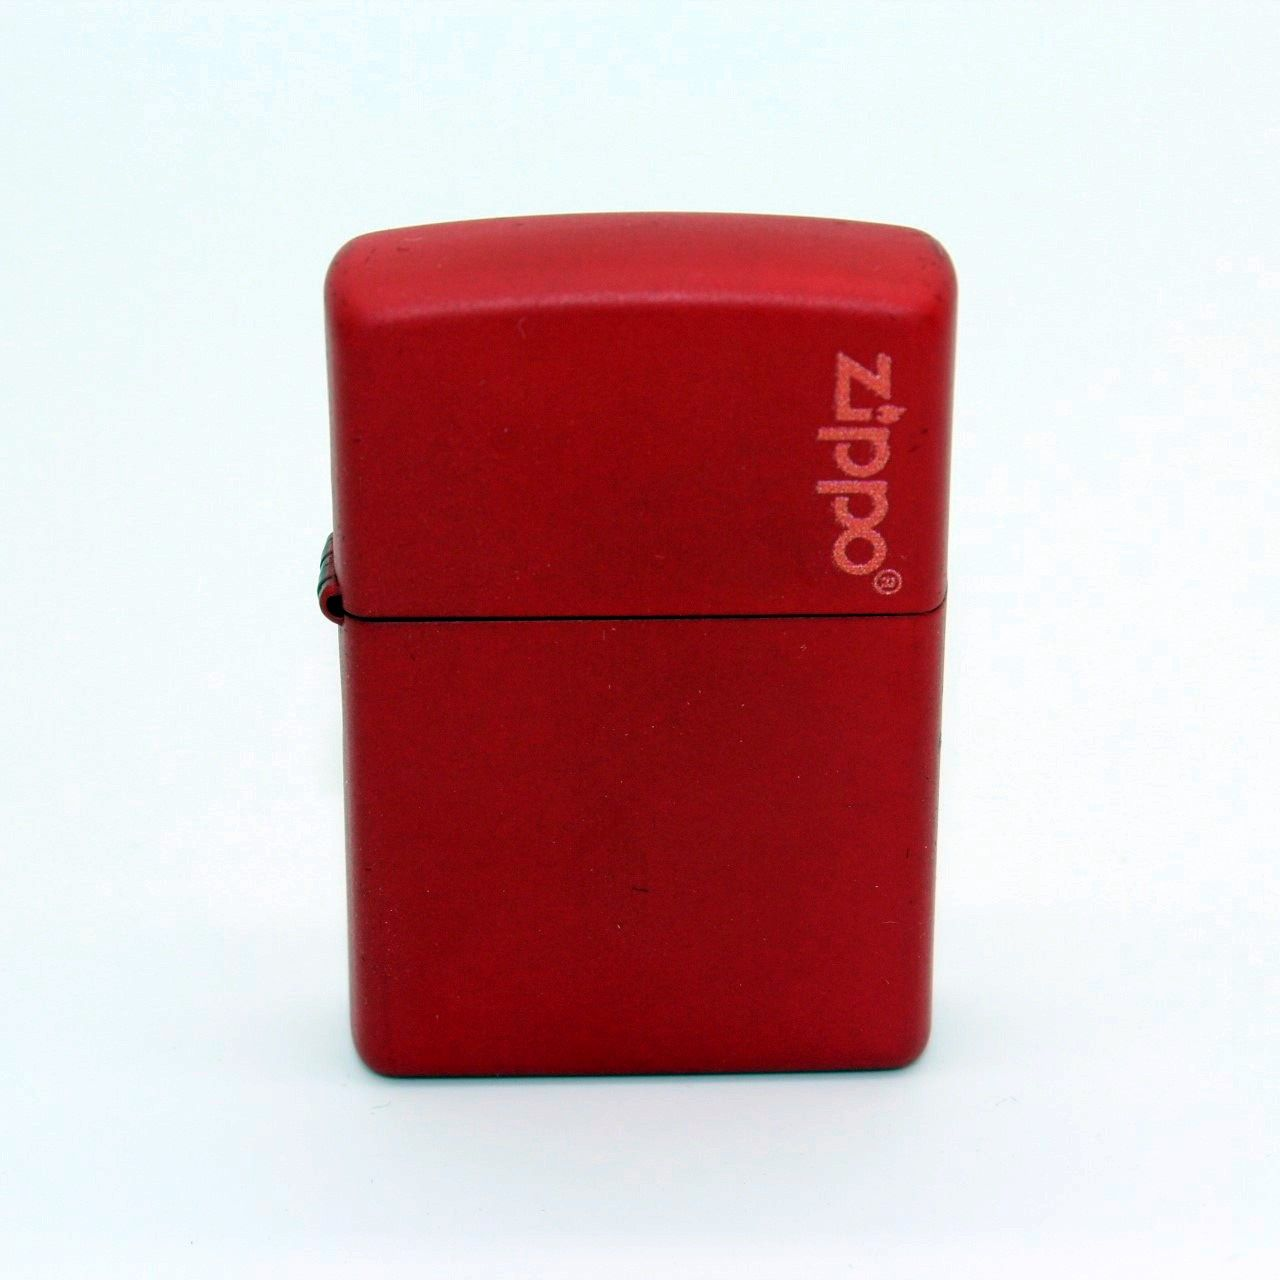 Zippo - Laranja com logo Zippo